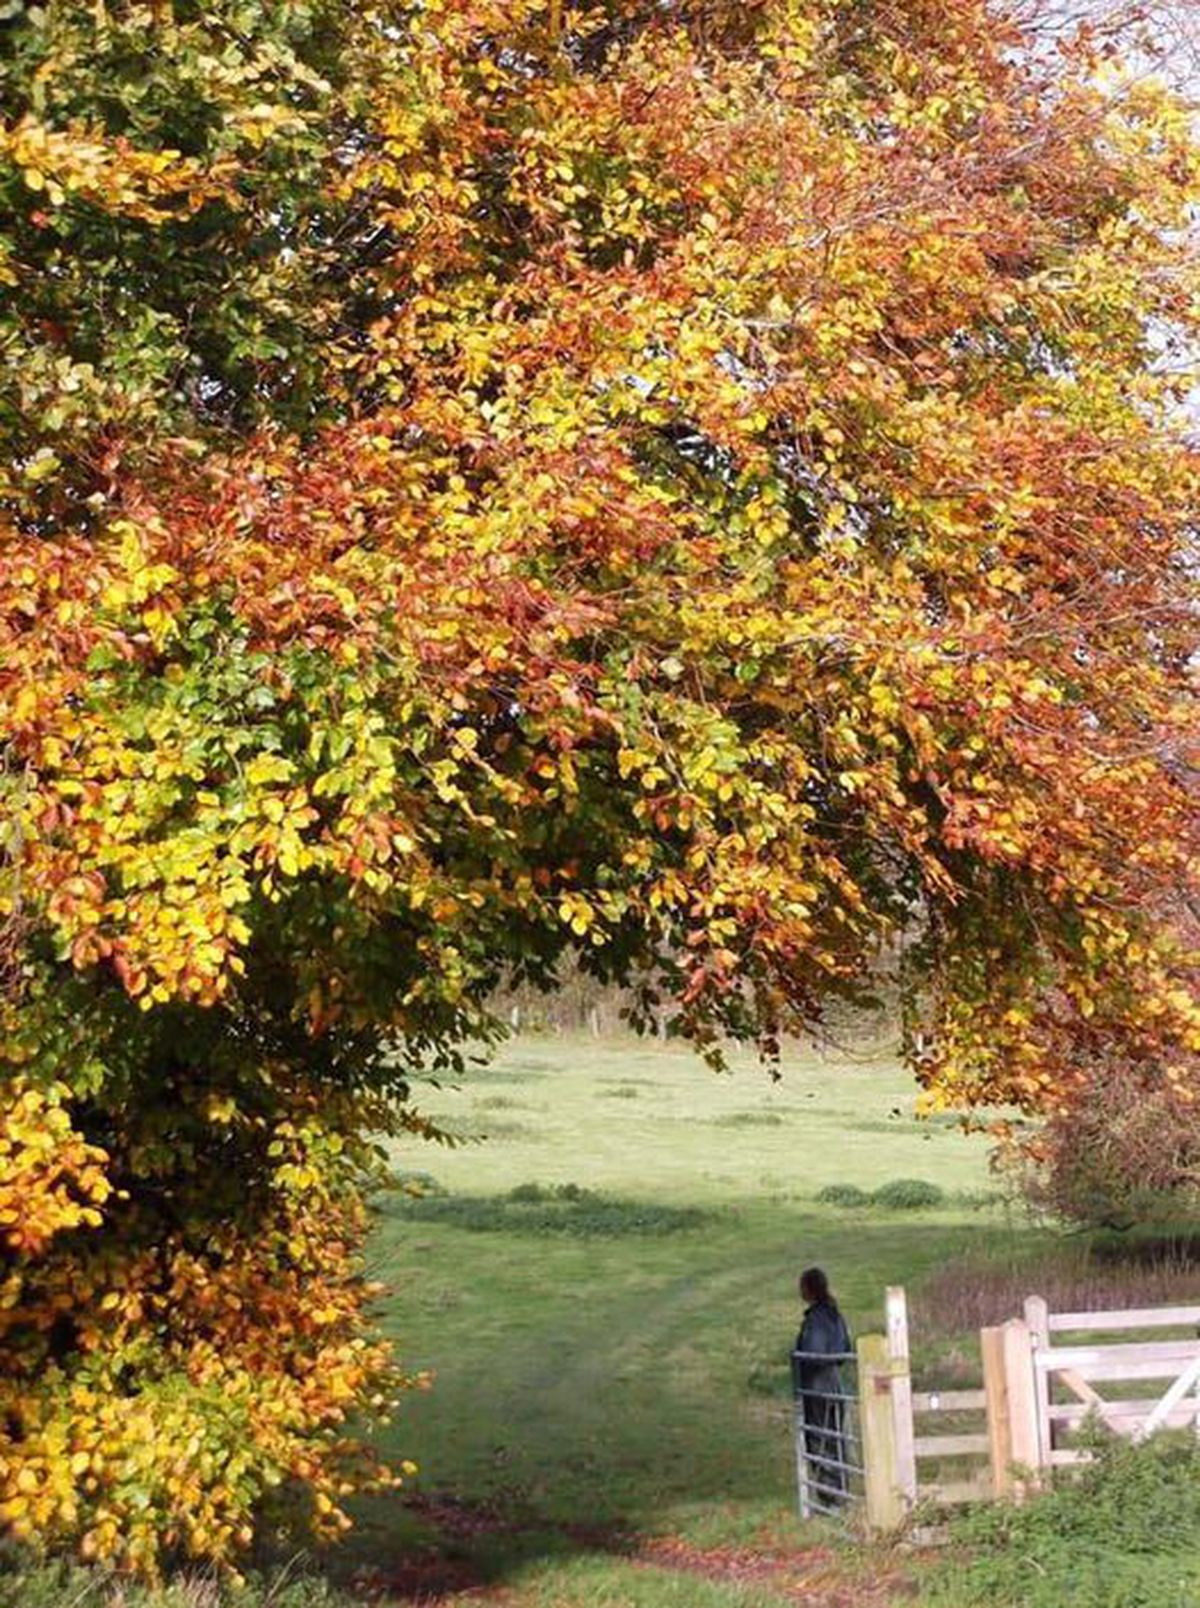 Stunning autumn scene near Trefonen captured on her camera by Ruth Dawes